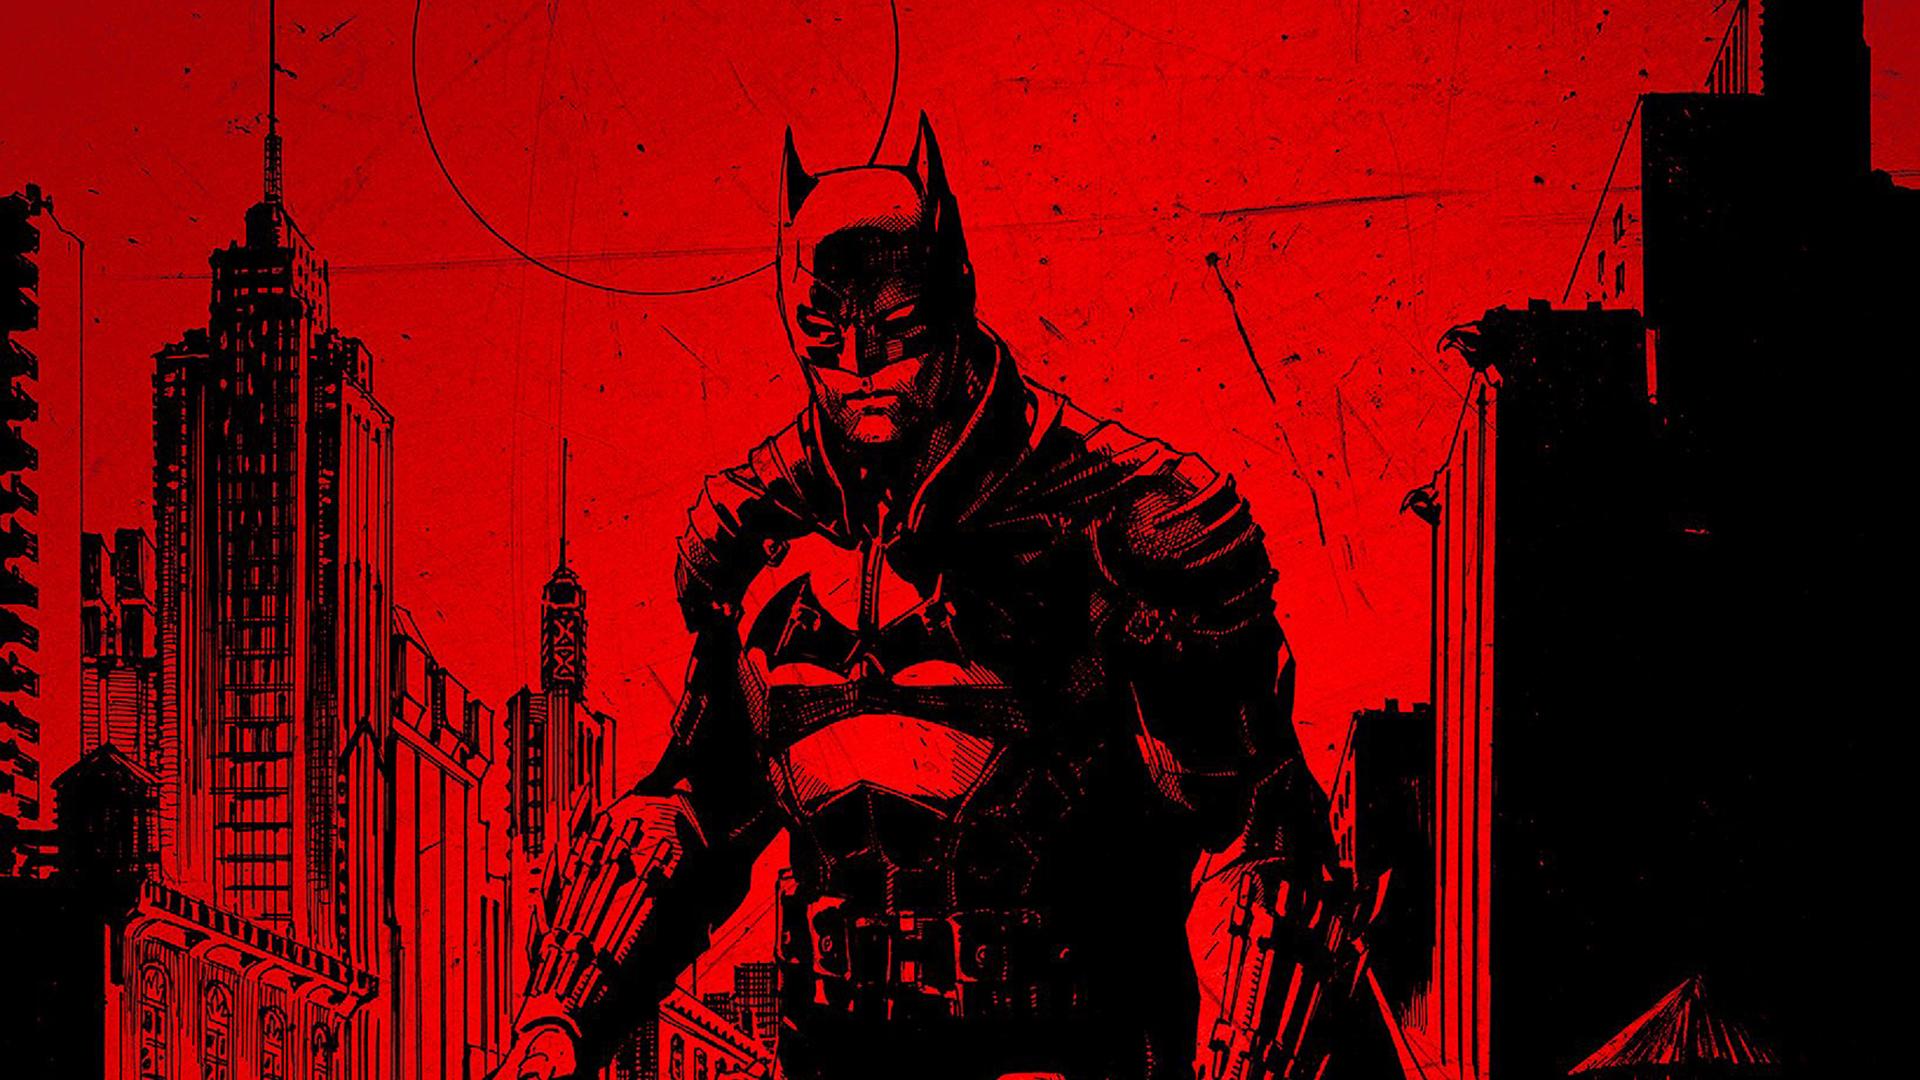 1920x1080 The Batman Official Poster 1080P Laptop Full HD ...